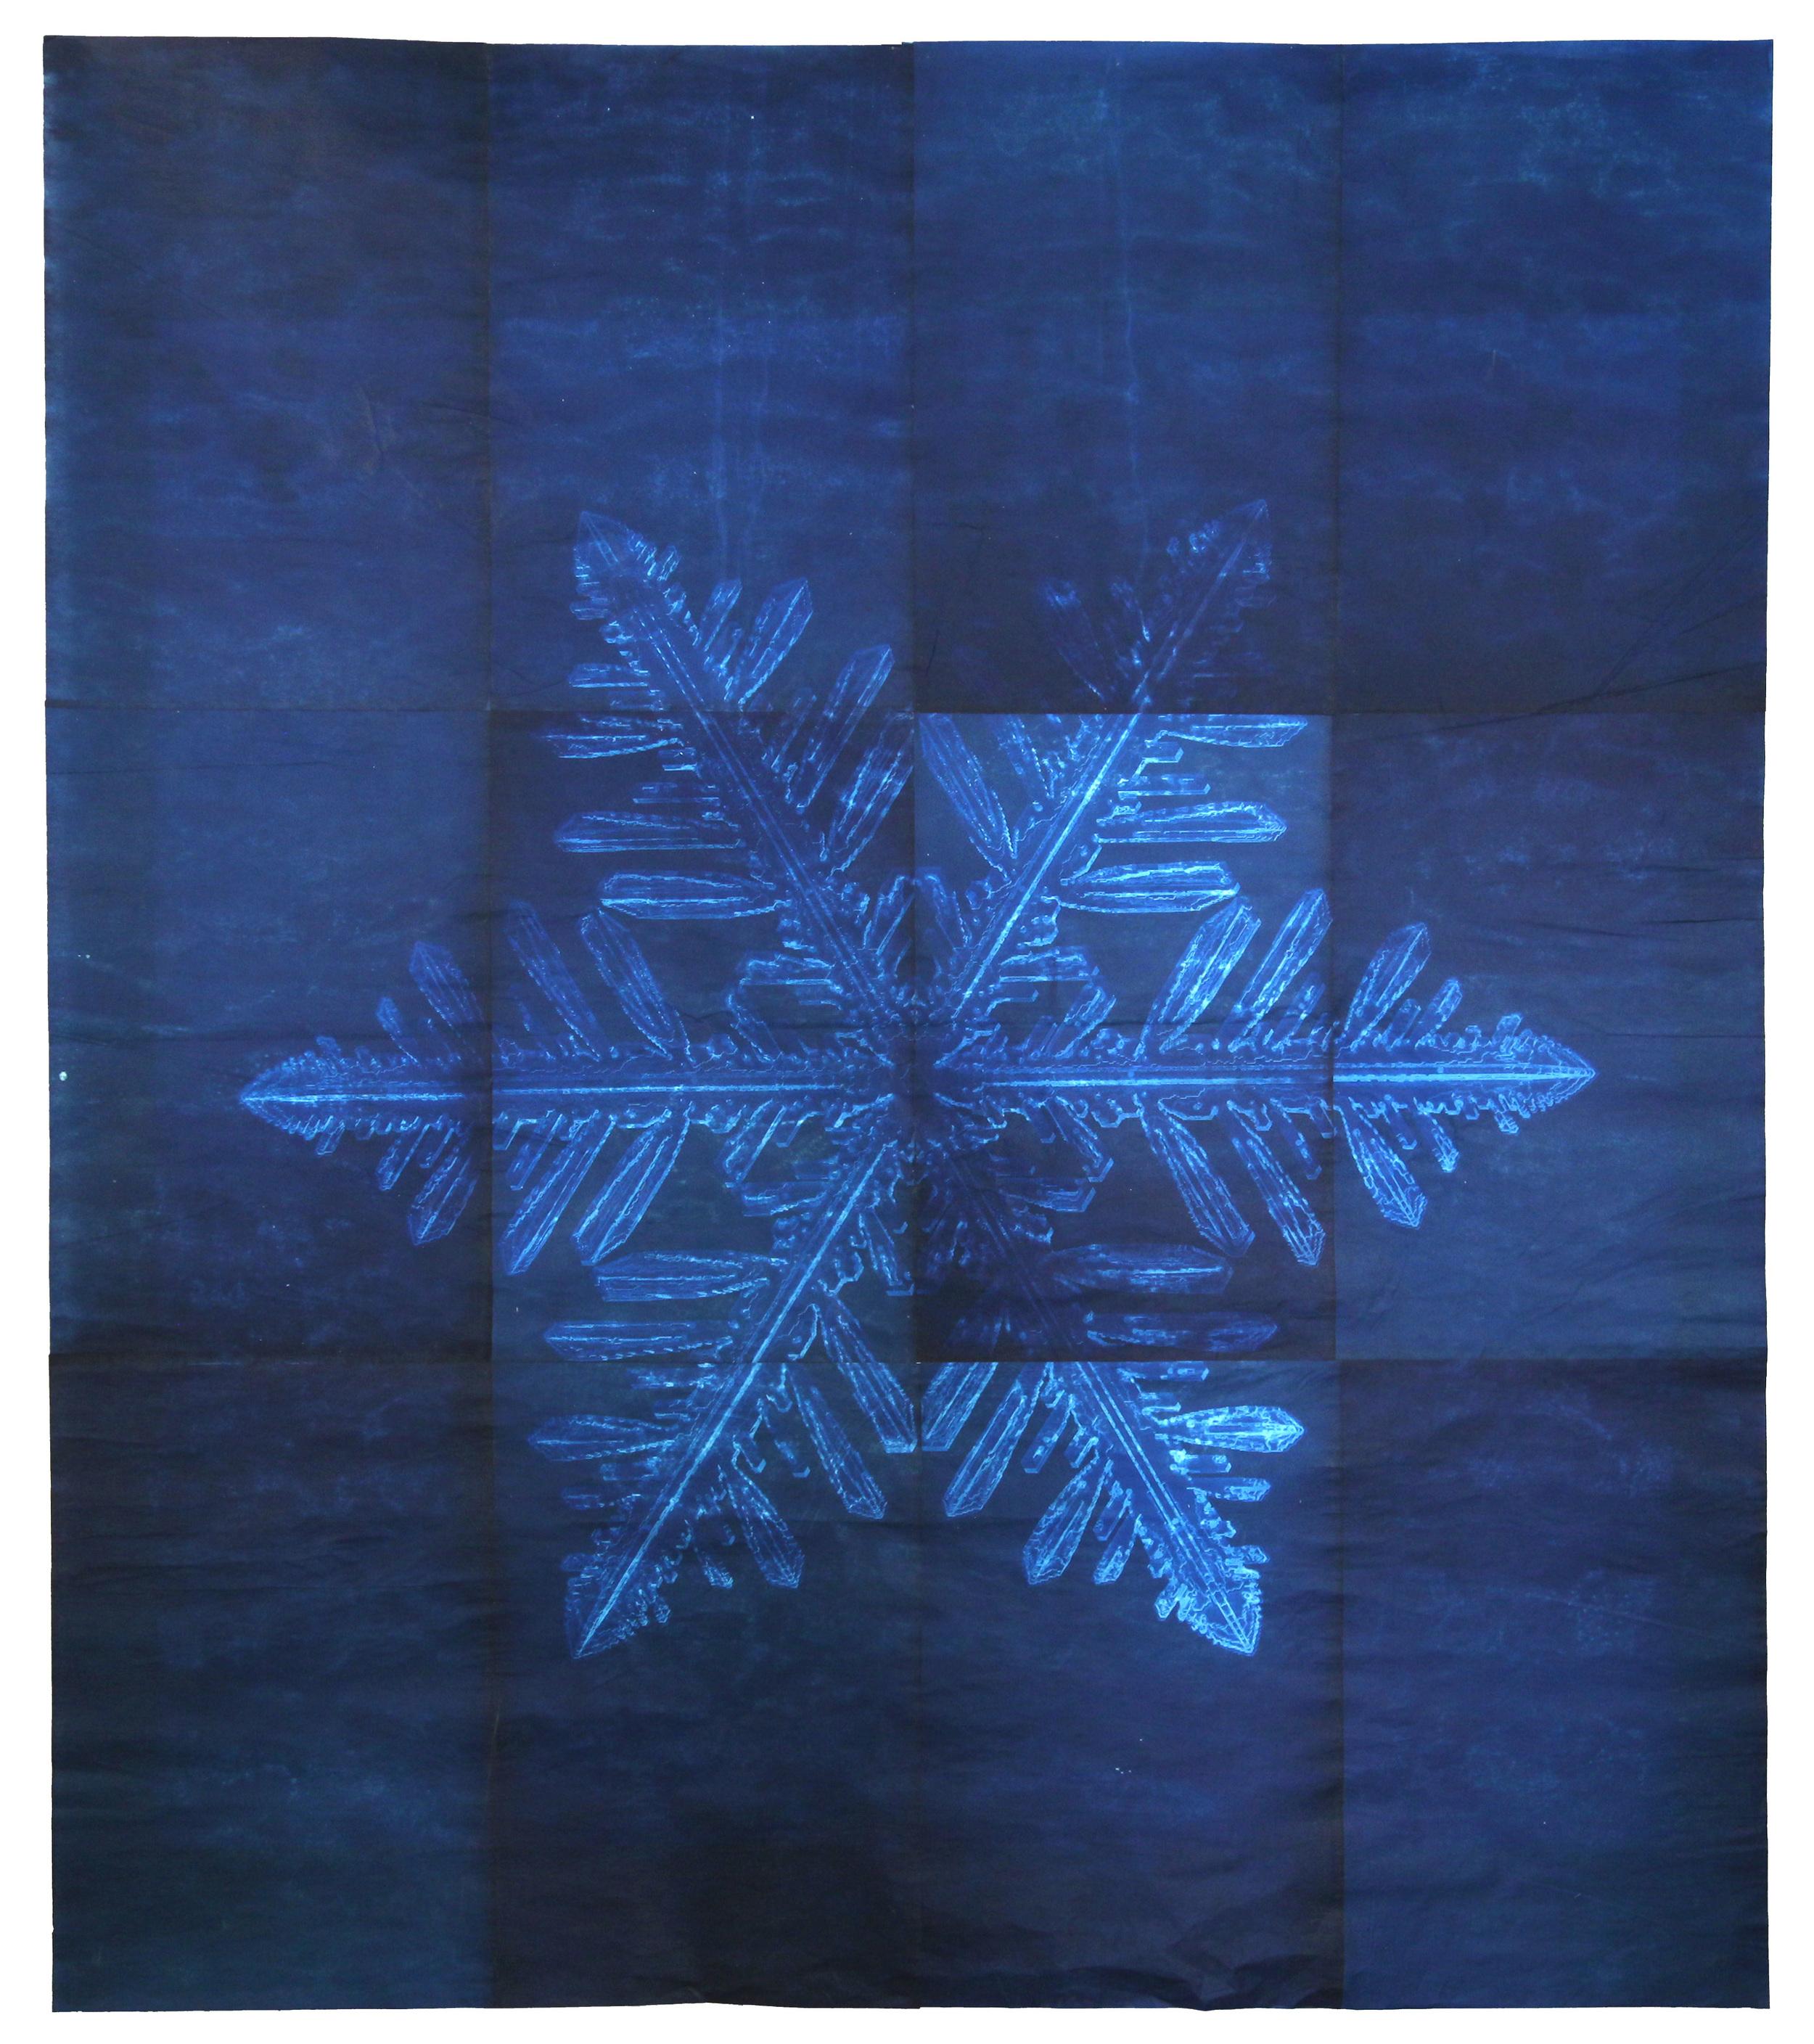 Snowflake #8, 2011